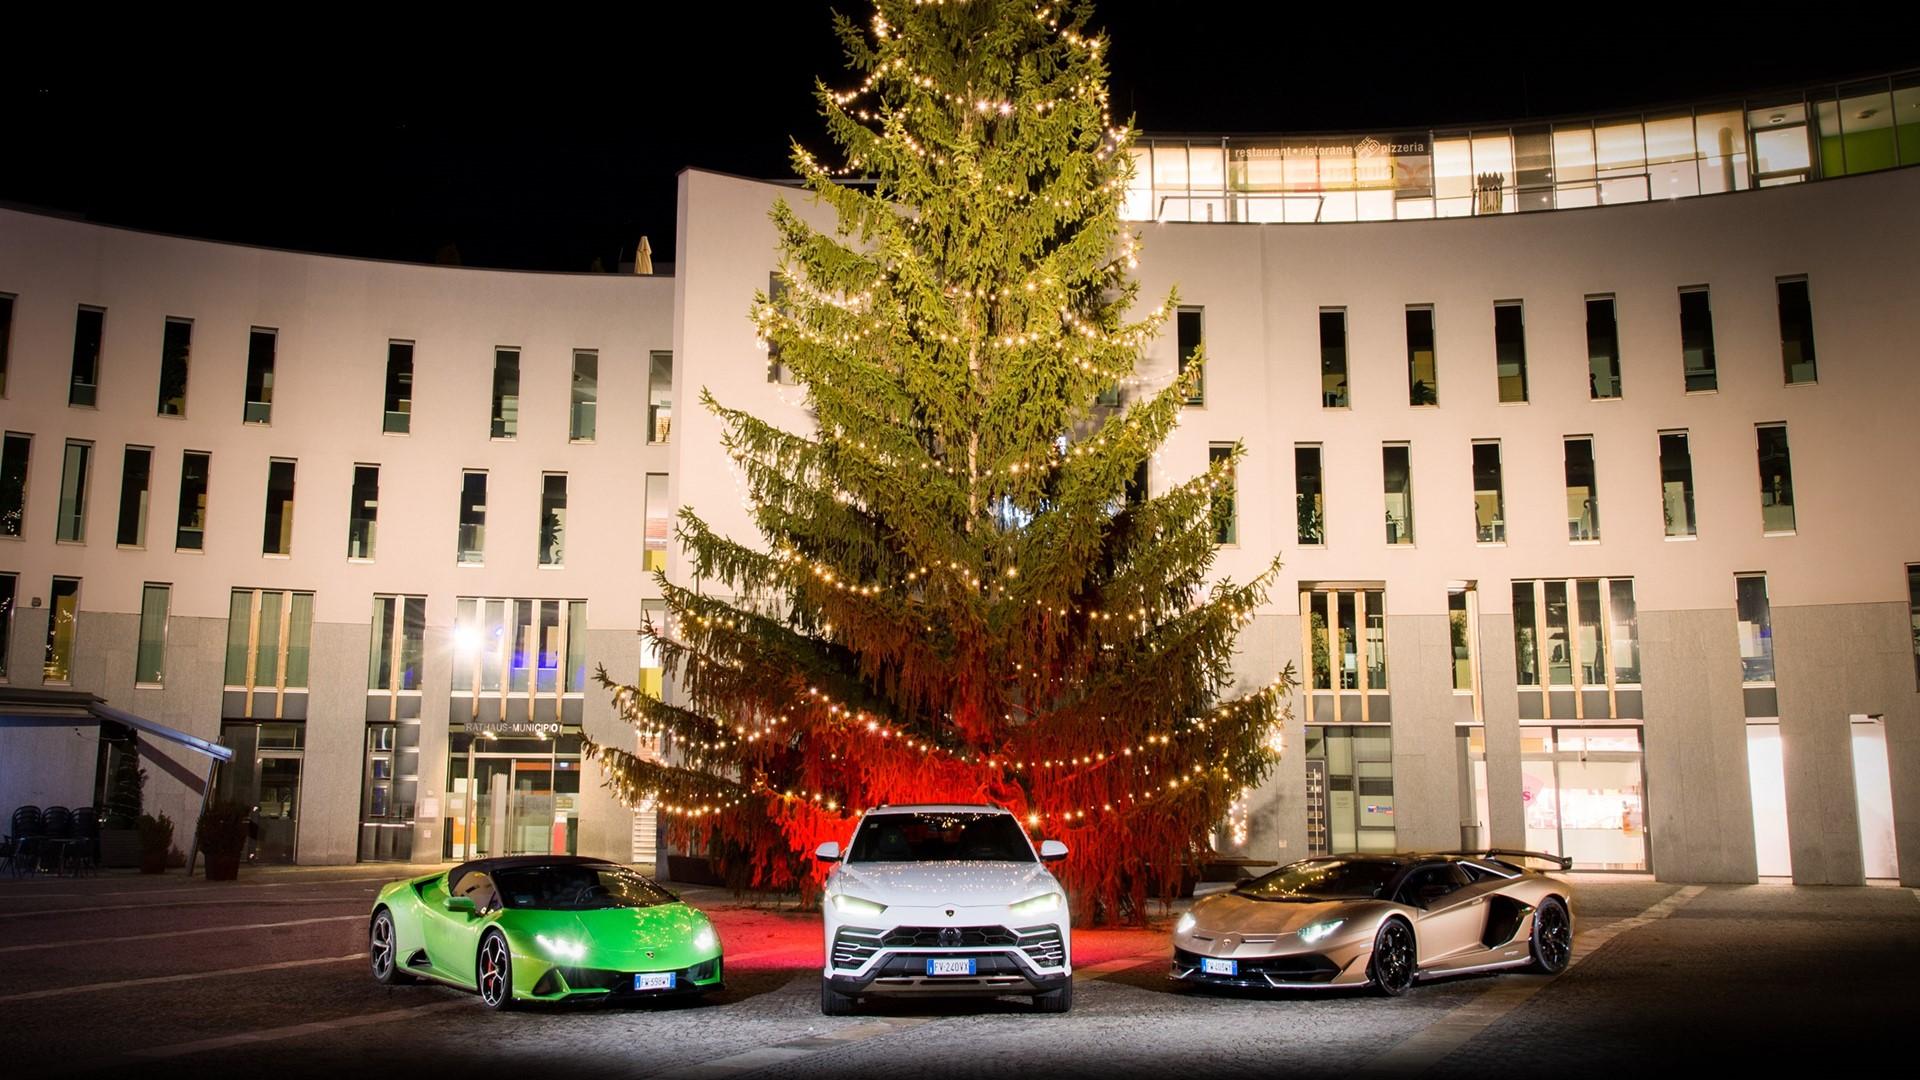 Lamborghini Christmas Drive: a holiday journey with Aventador SVJ, Huracán EVO and Urus celebrates a successful 2019 - Image 1